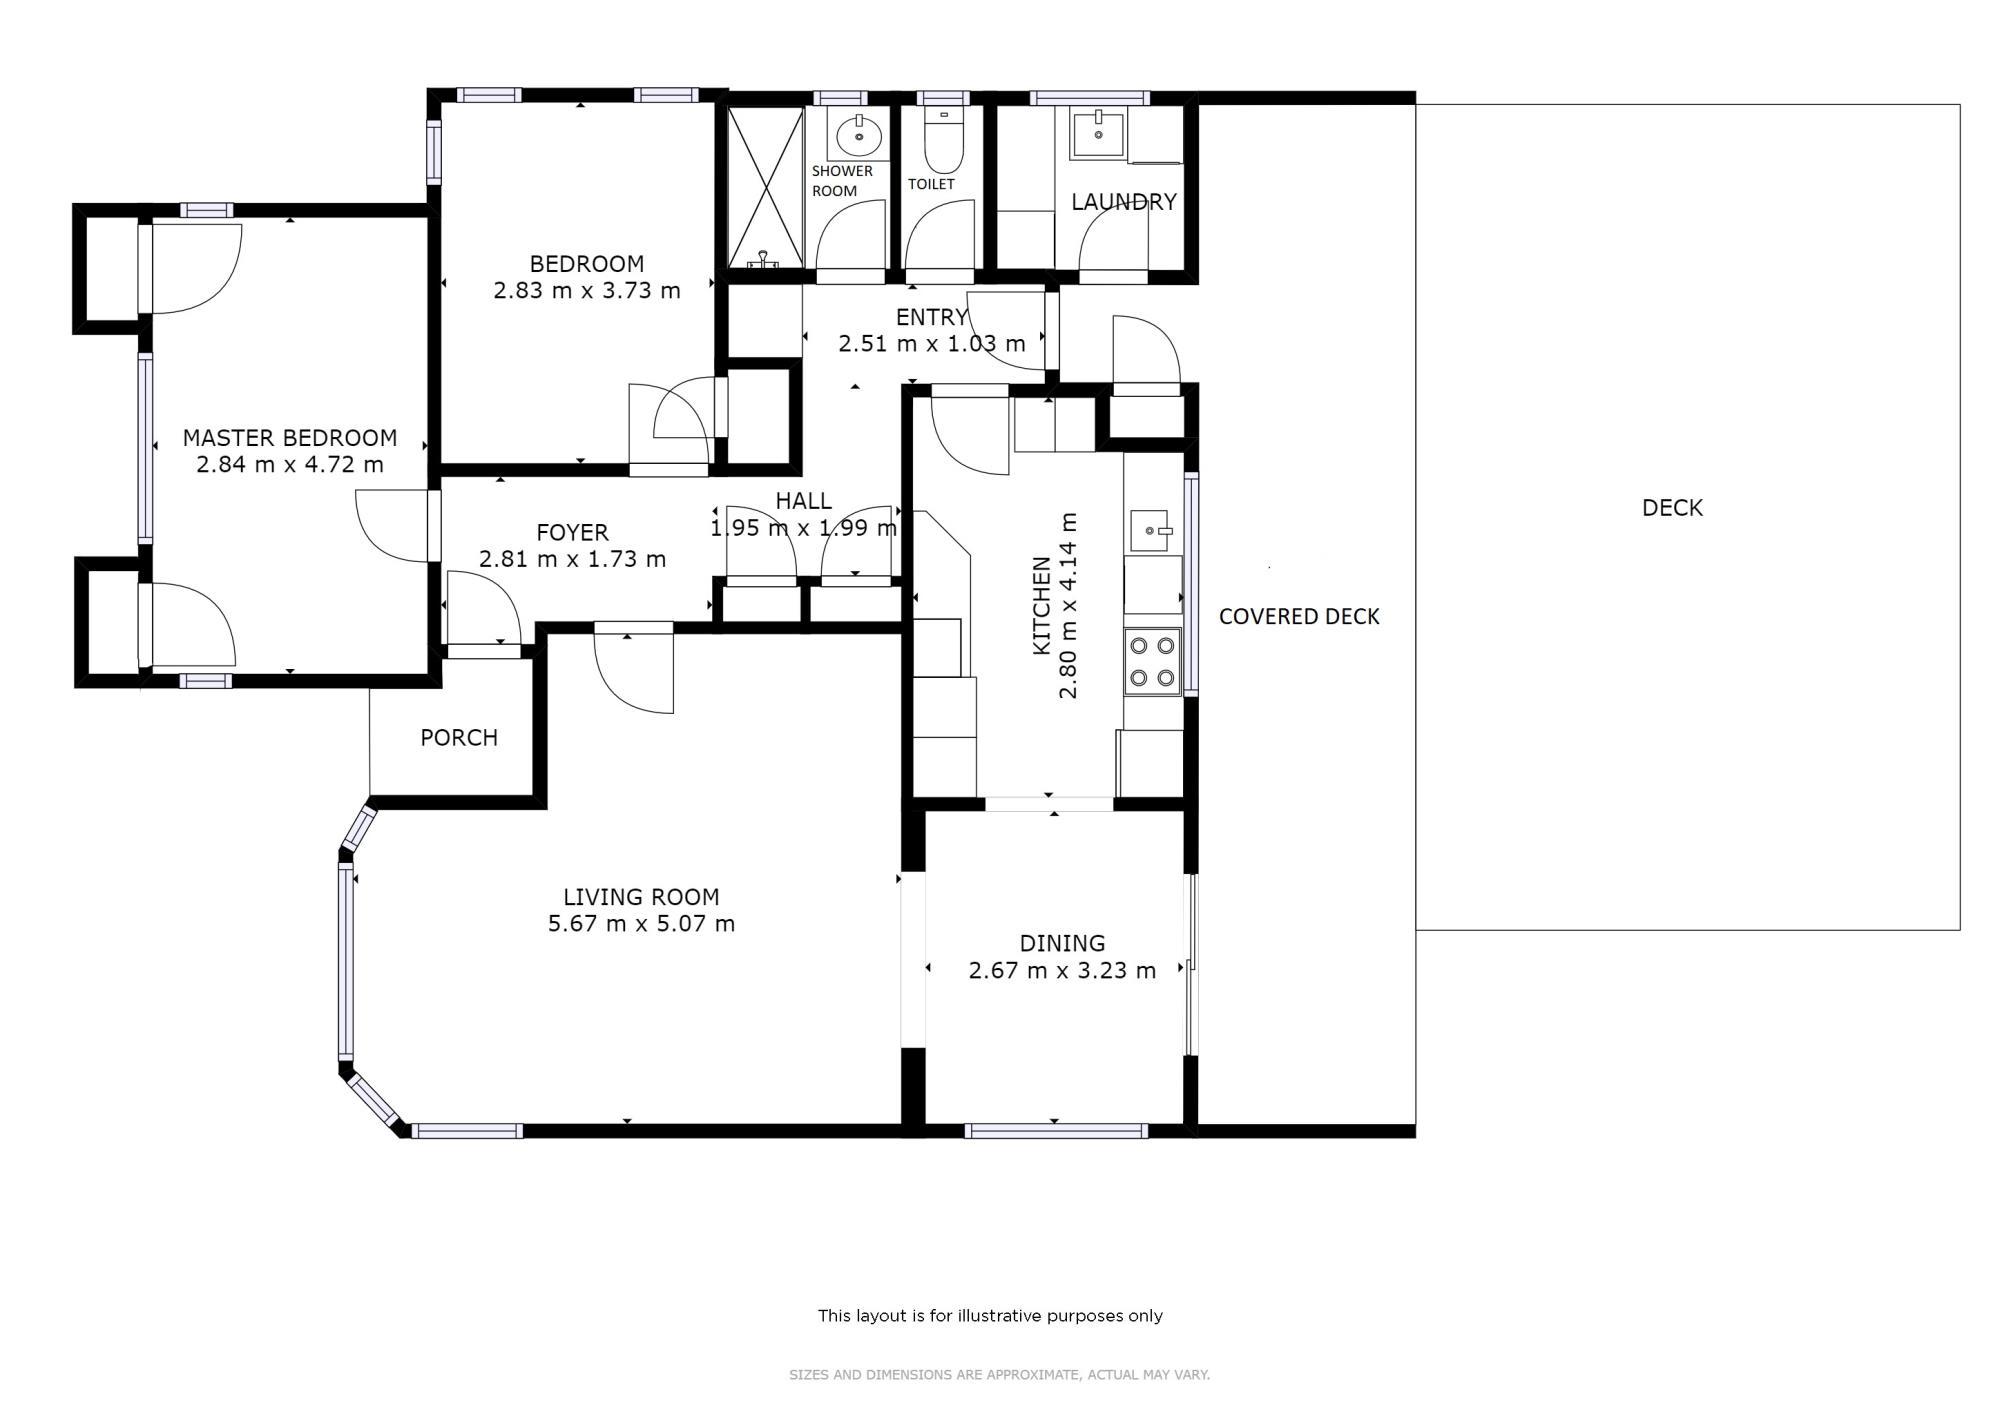 30 Lovatt Crescent Mairtownproperty floorplan image